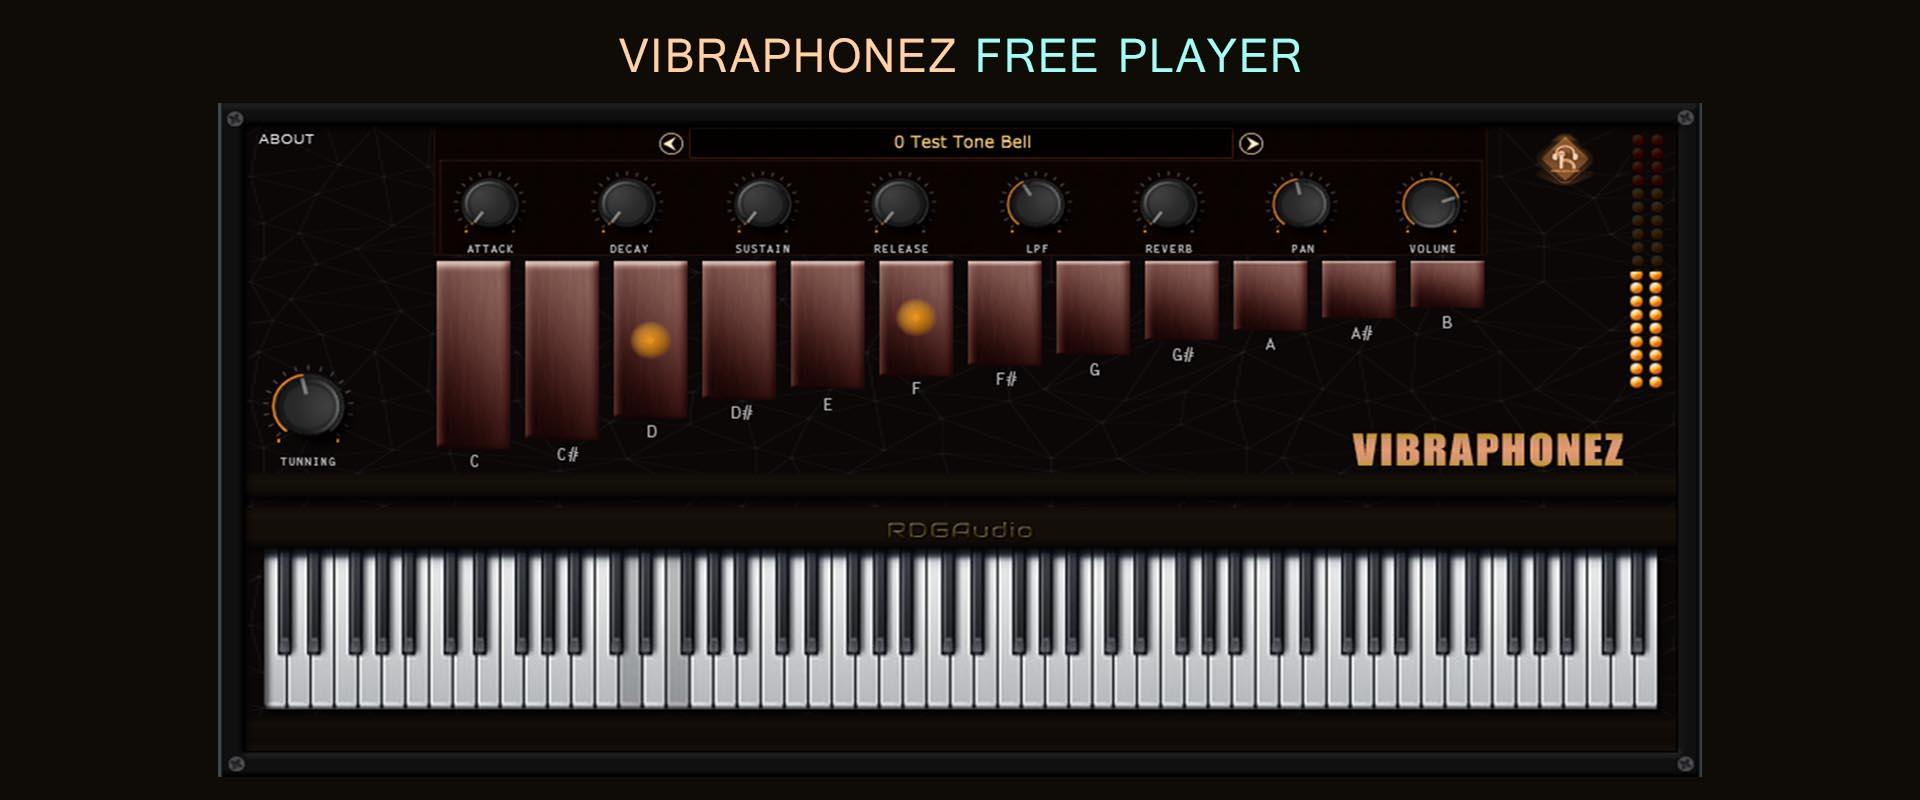 Vibraphonez Free Player for Slider